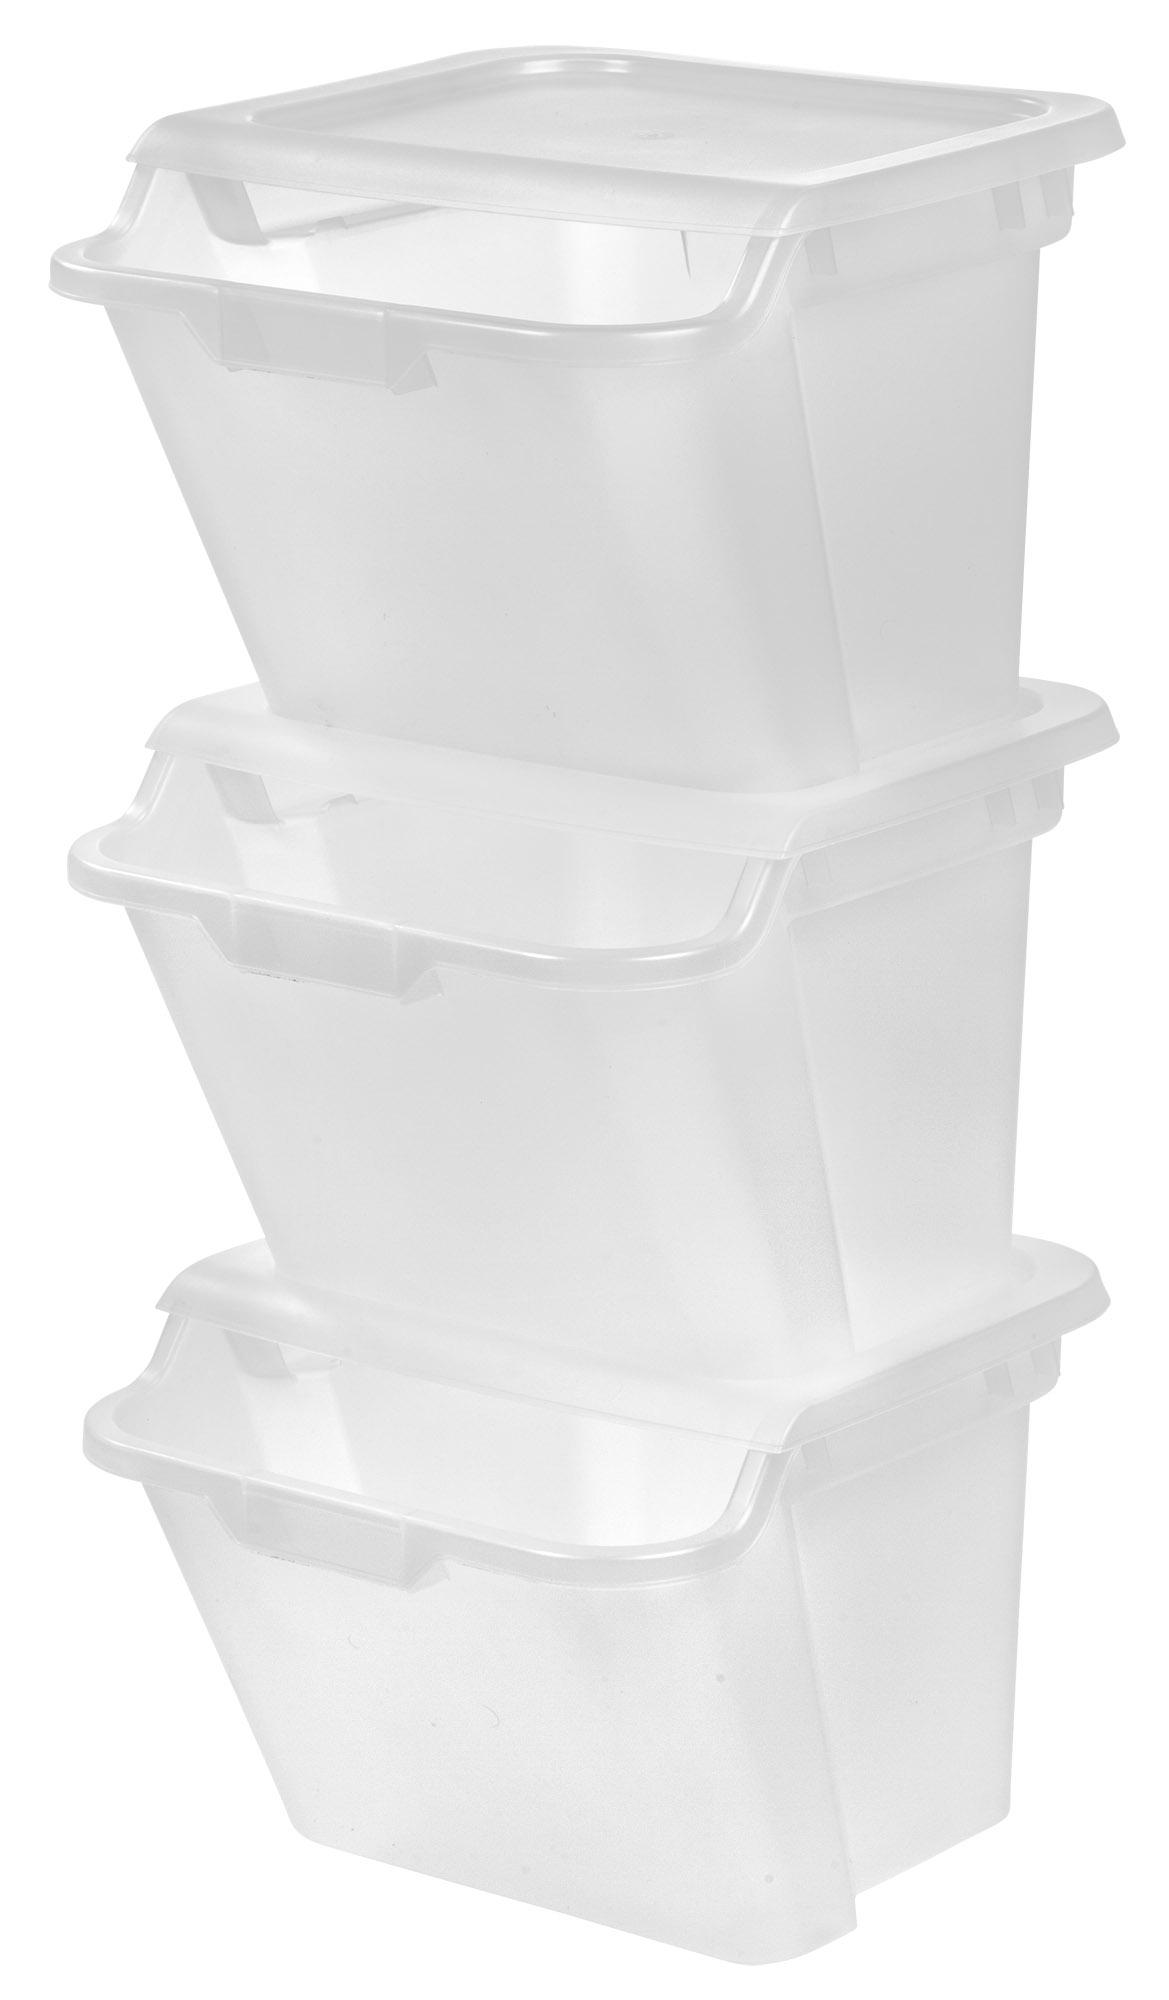 Amazon.com: IRIS Stackable Storage Bins, 6-Piece: Home ...